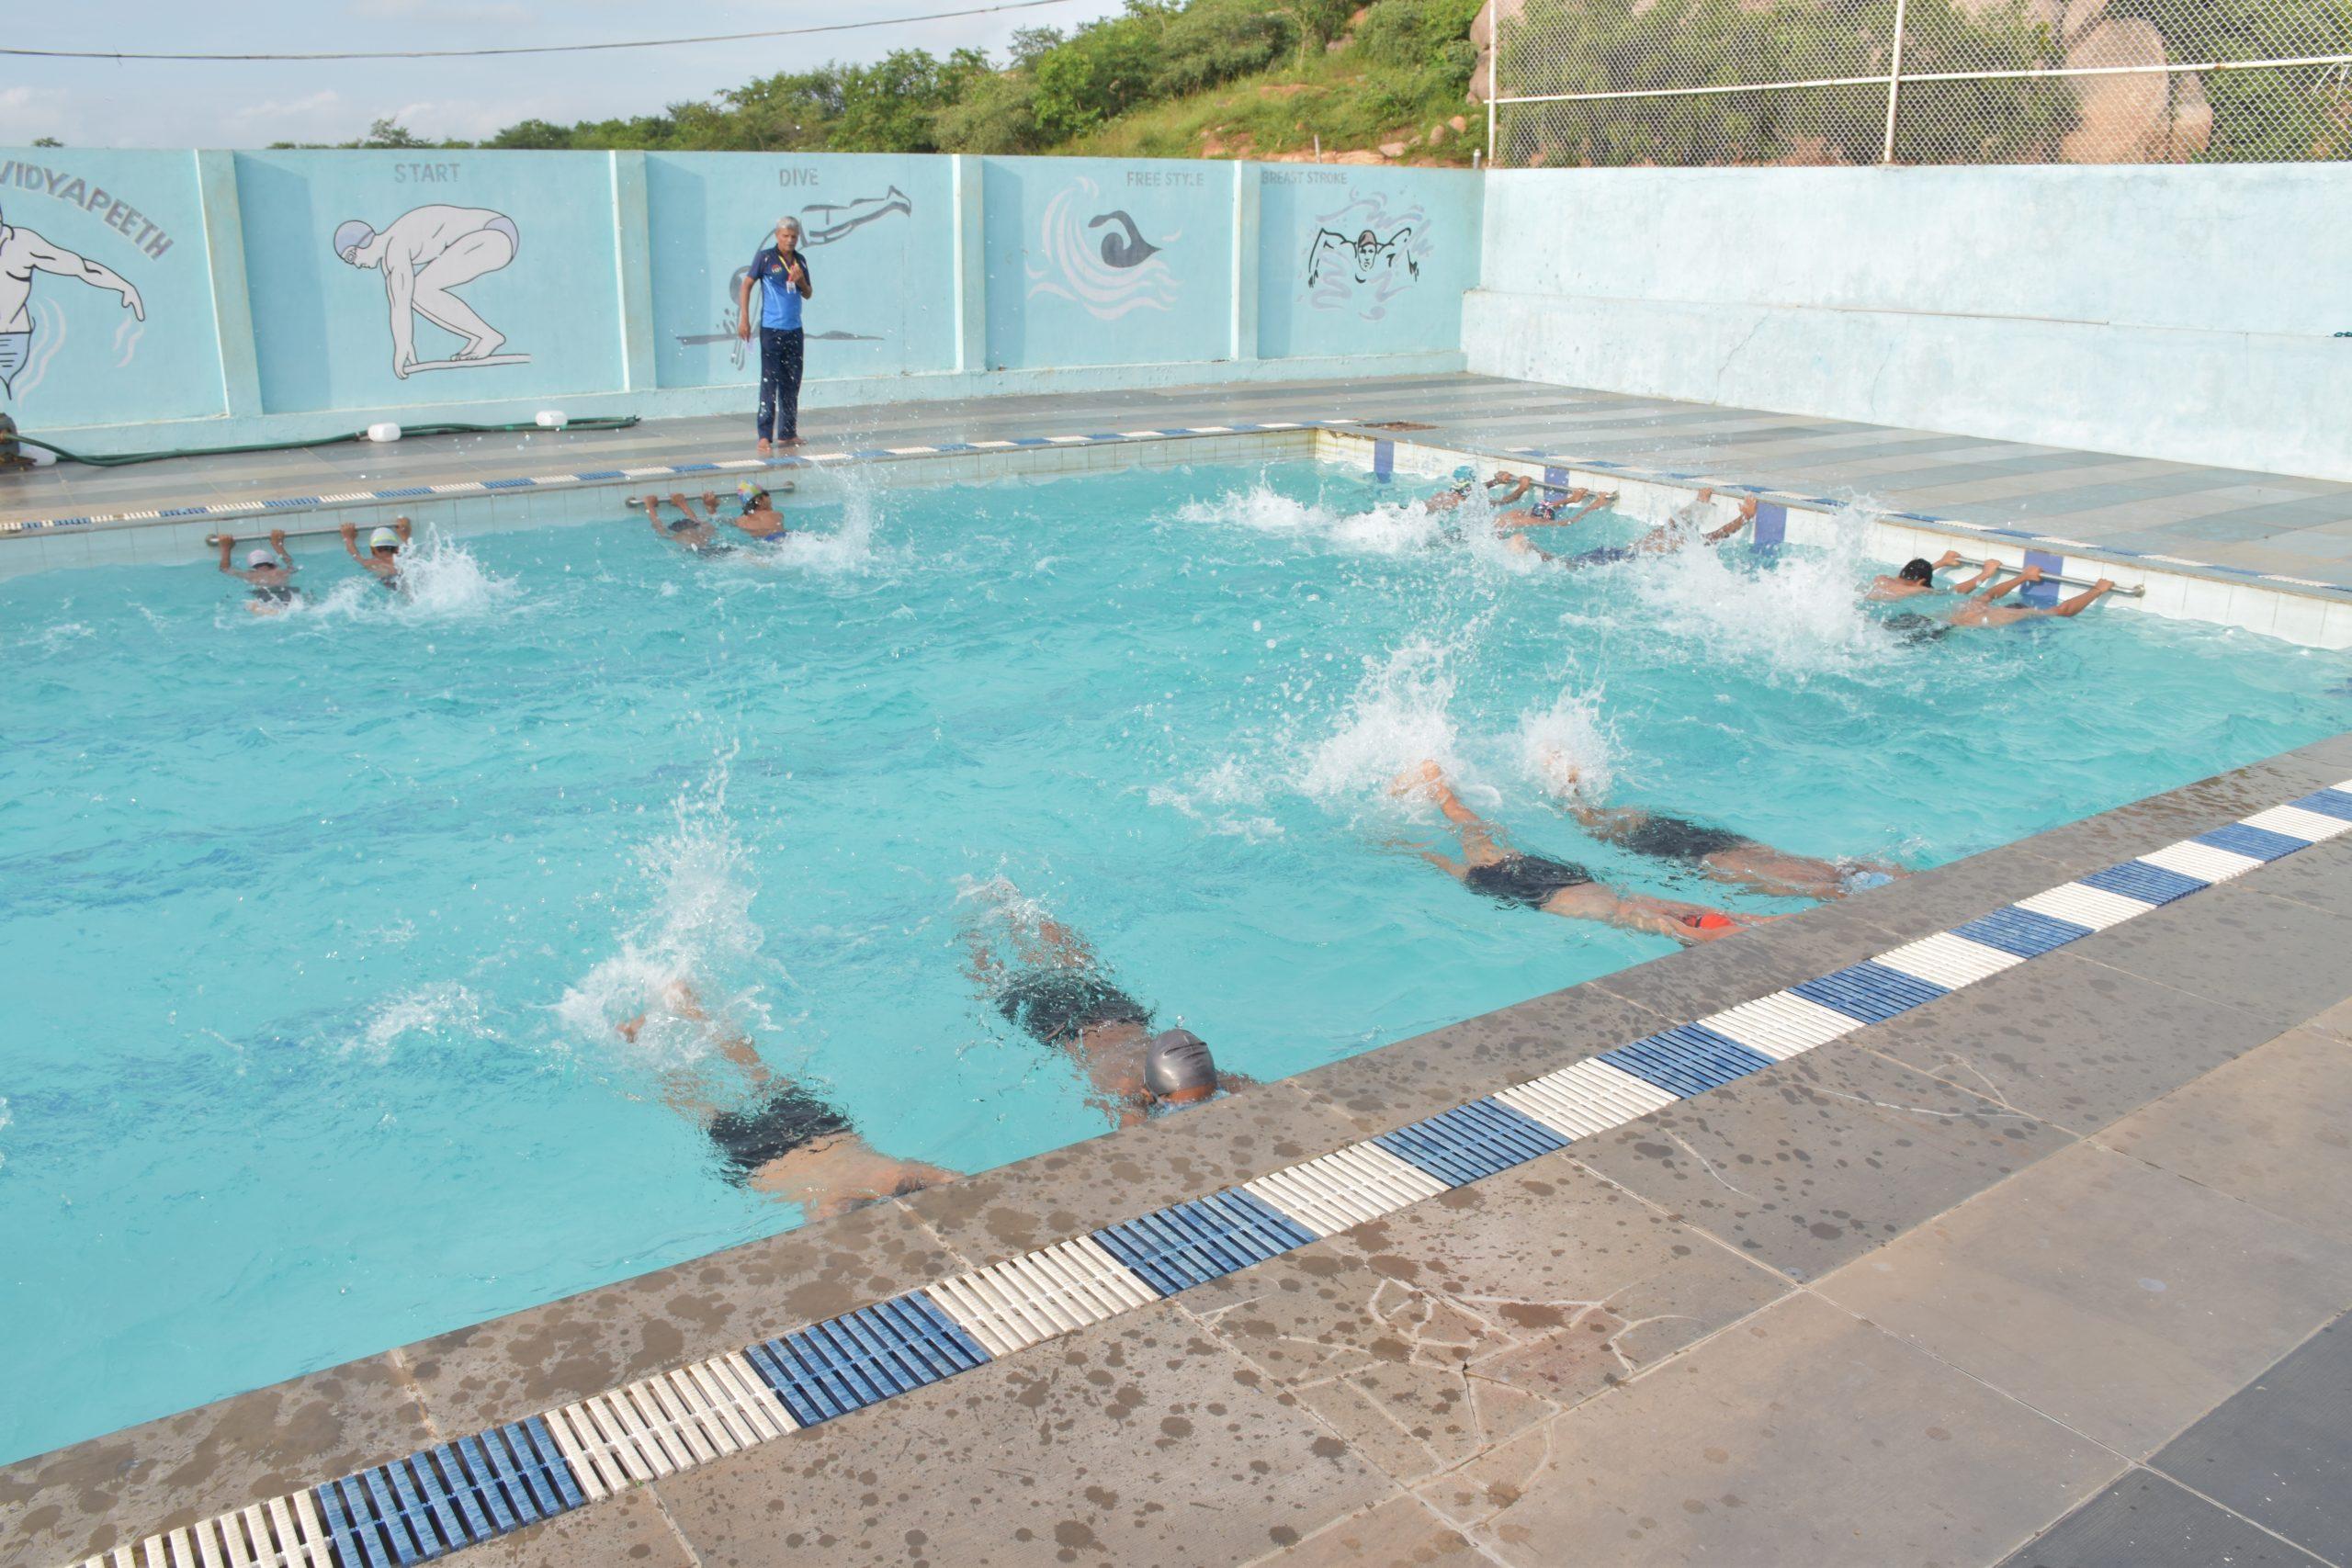 SHREE NEELAKANTH VIDYAPEETH Students Swimming